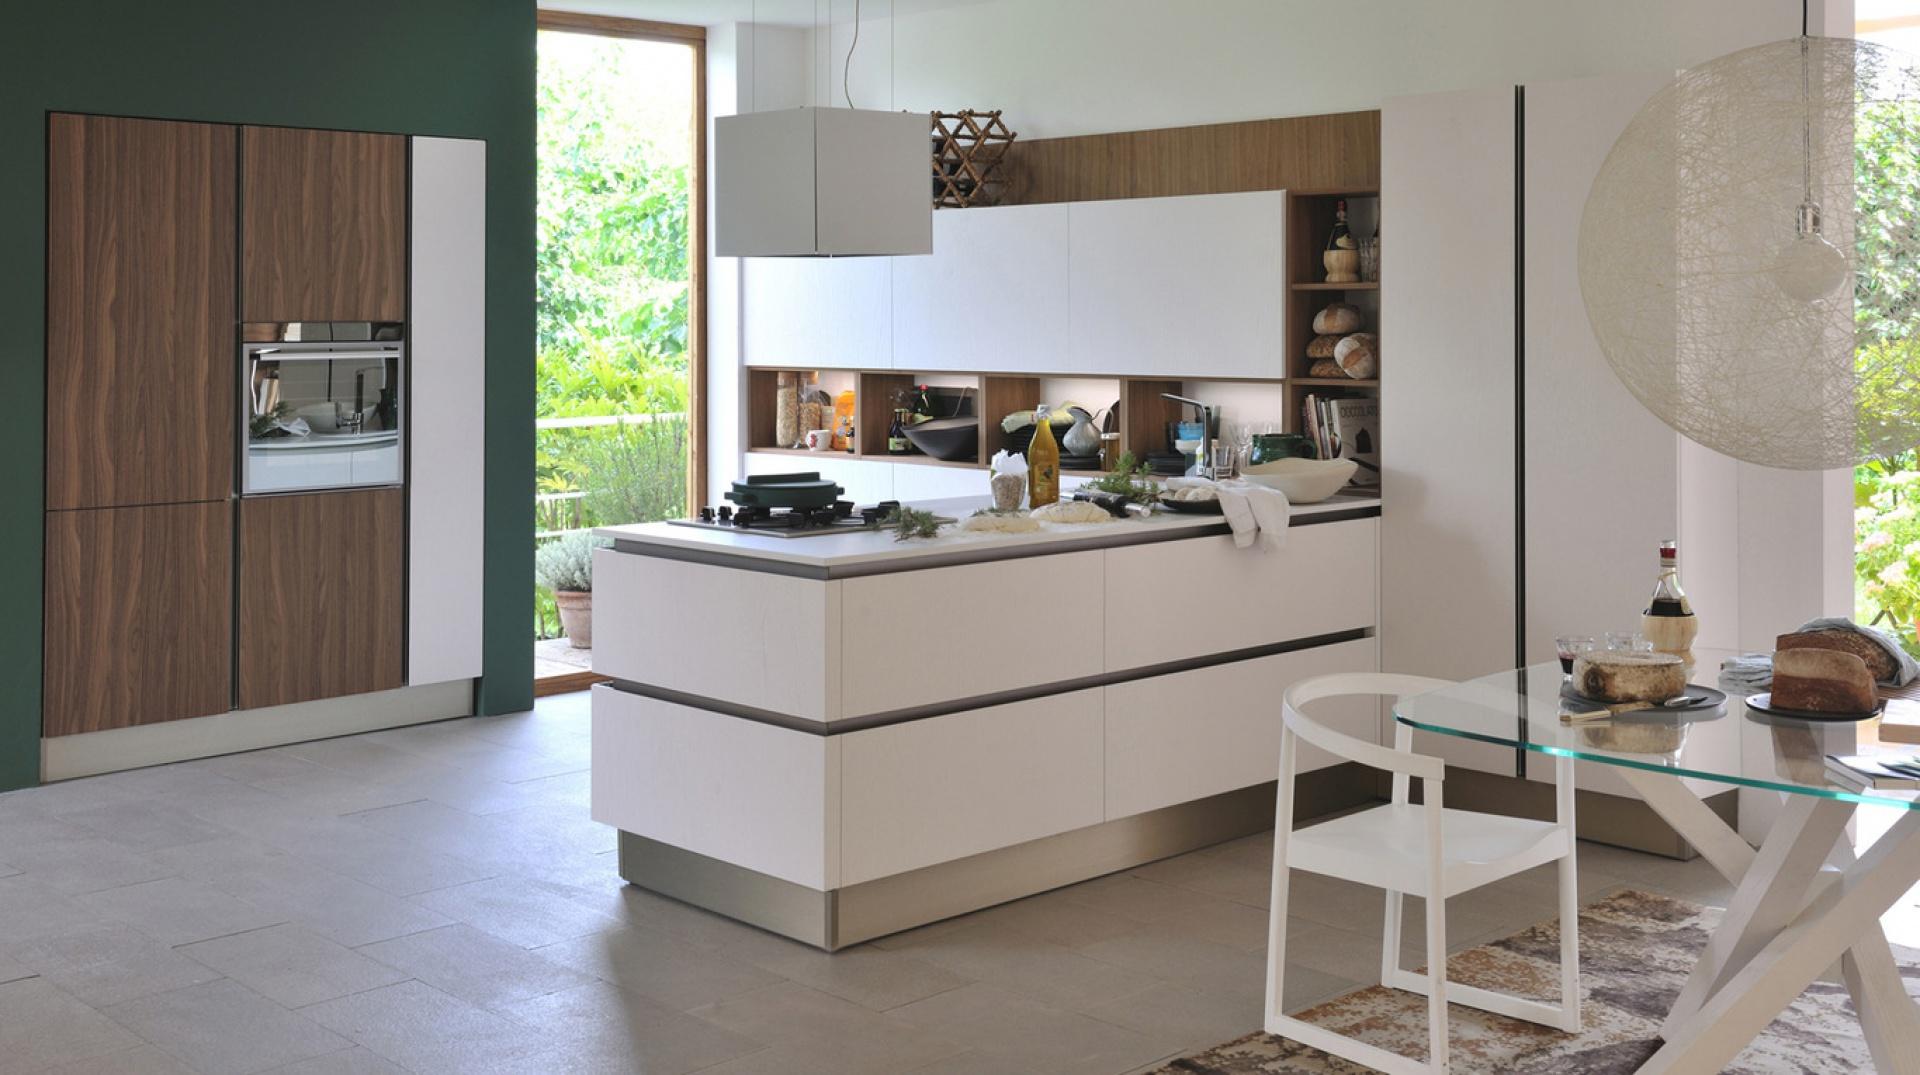 Fabbrica cucine roma